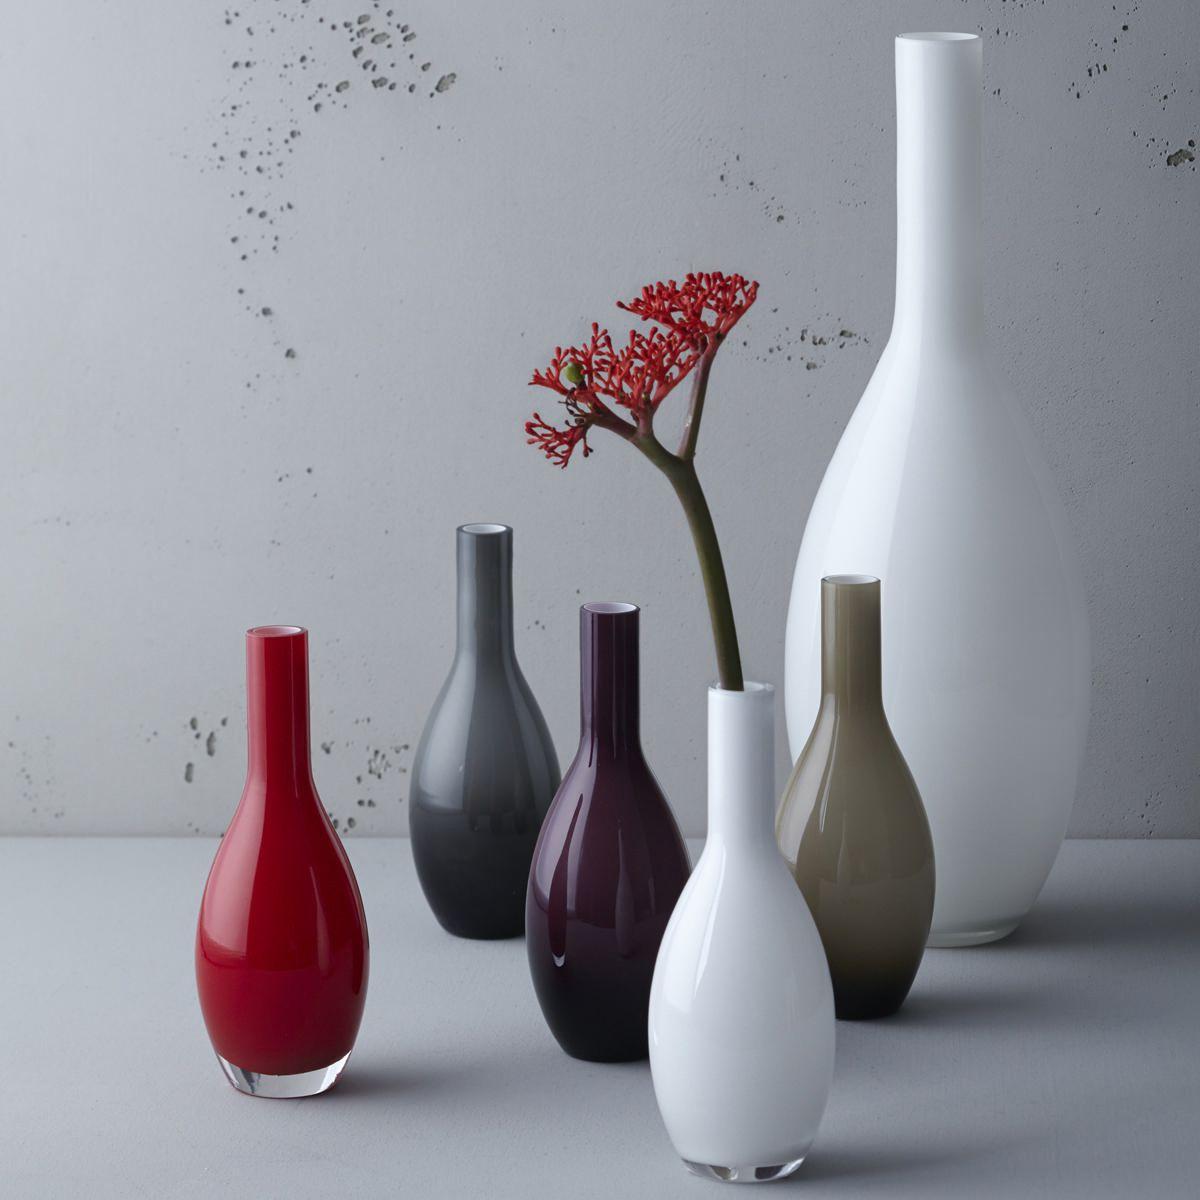 Leonardo Vase Beauty 39cm rot N 003.xxl3  - Vază Beauty red 39 cm (L058715)